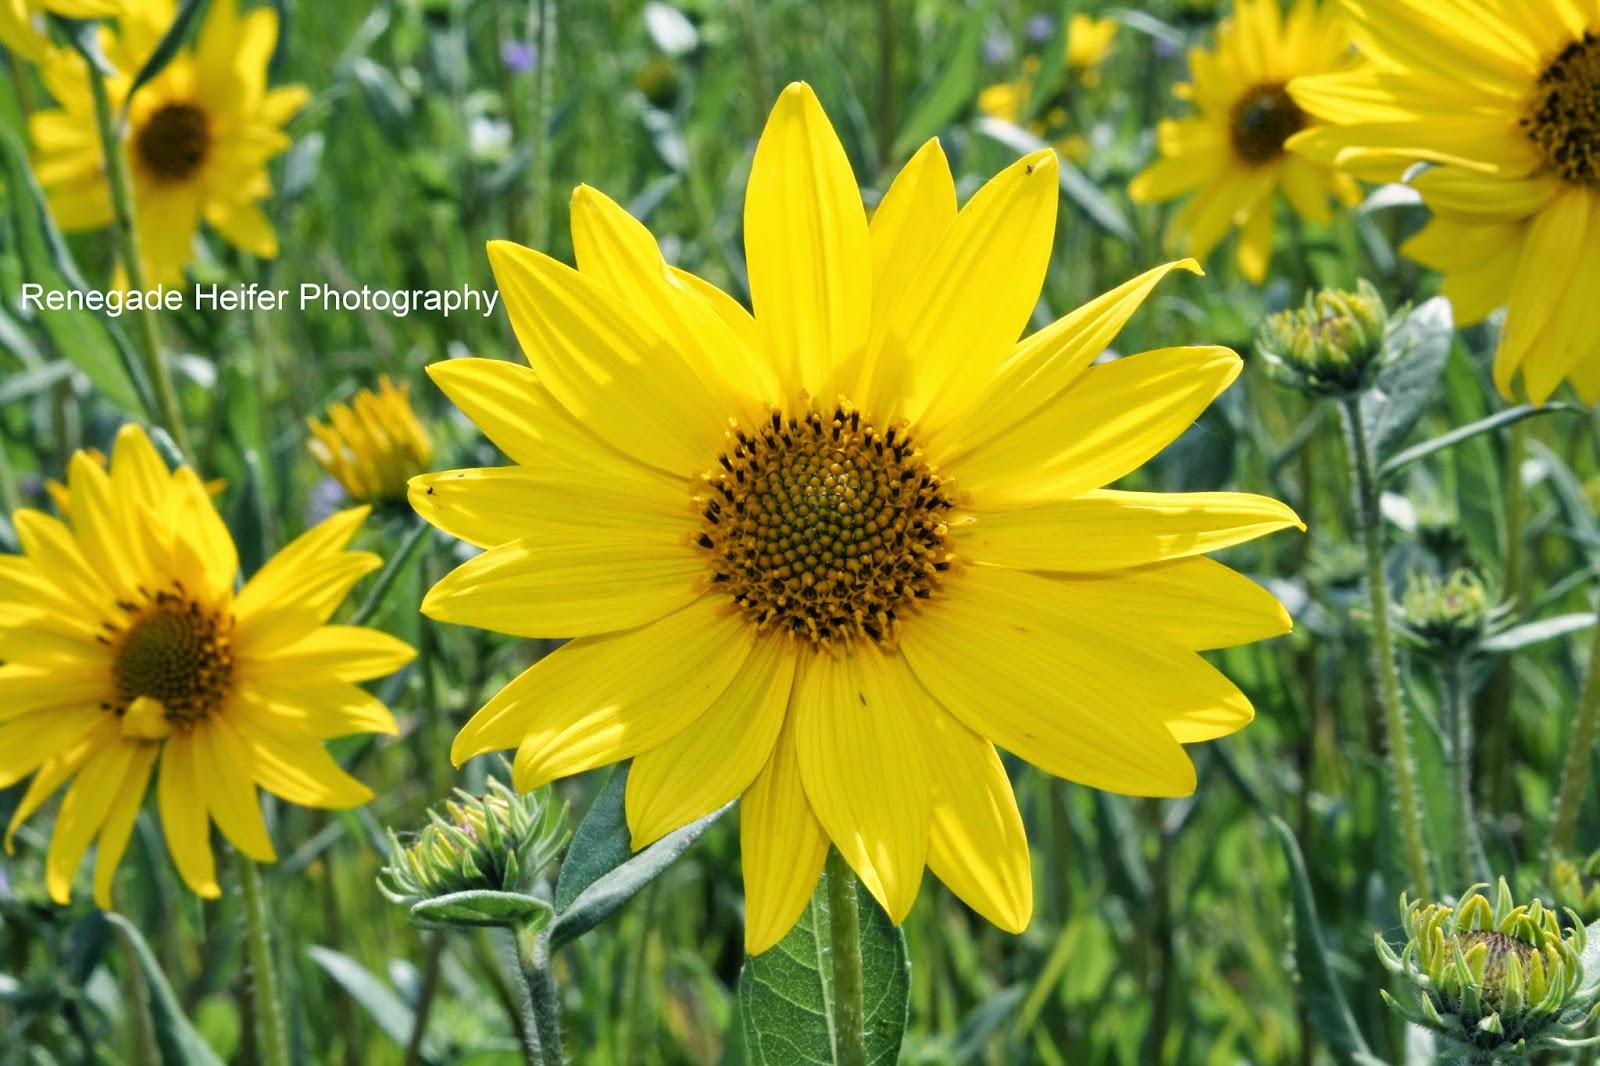 Renegade heifer photography wildflowers and weedflowers photo name sunny yellow prairie flower close up mightylinksfo